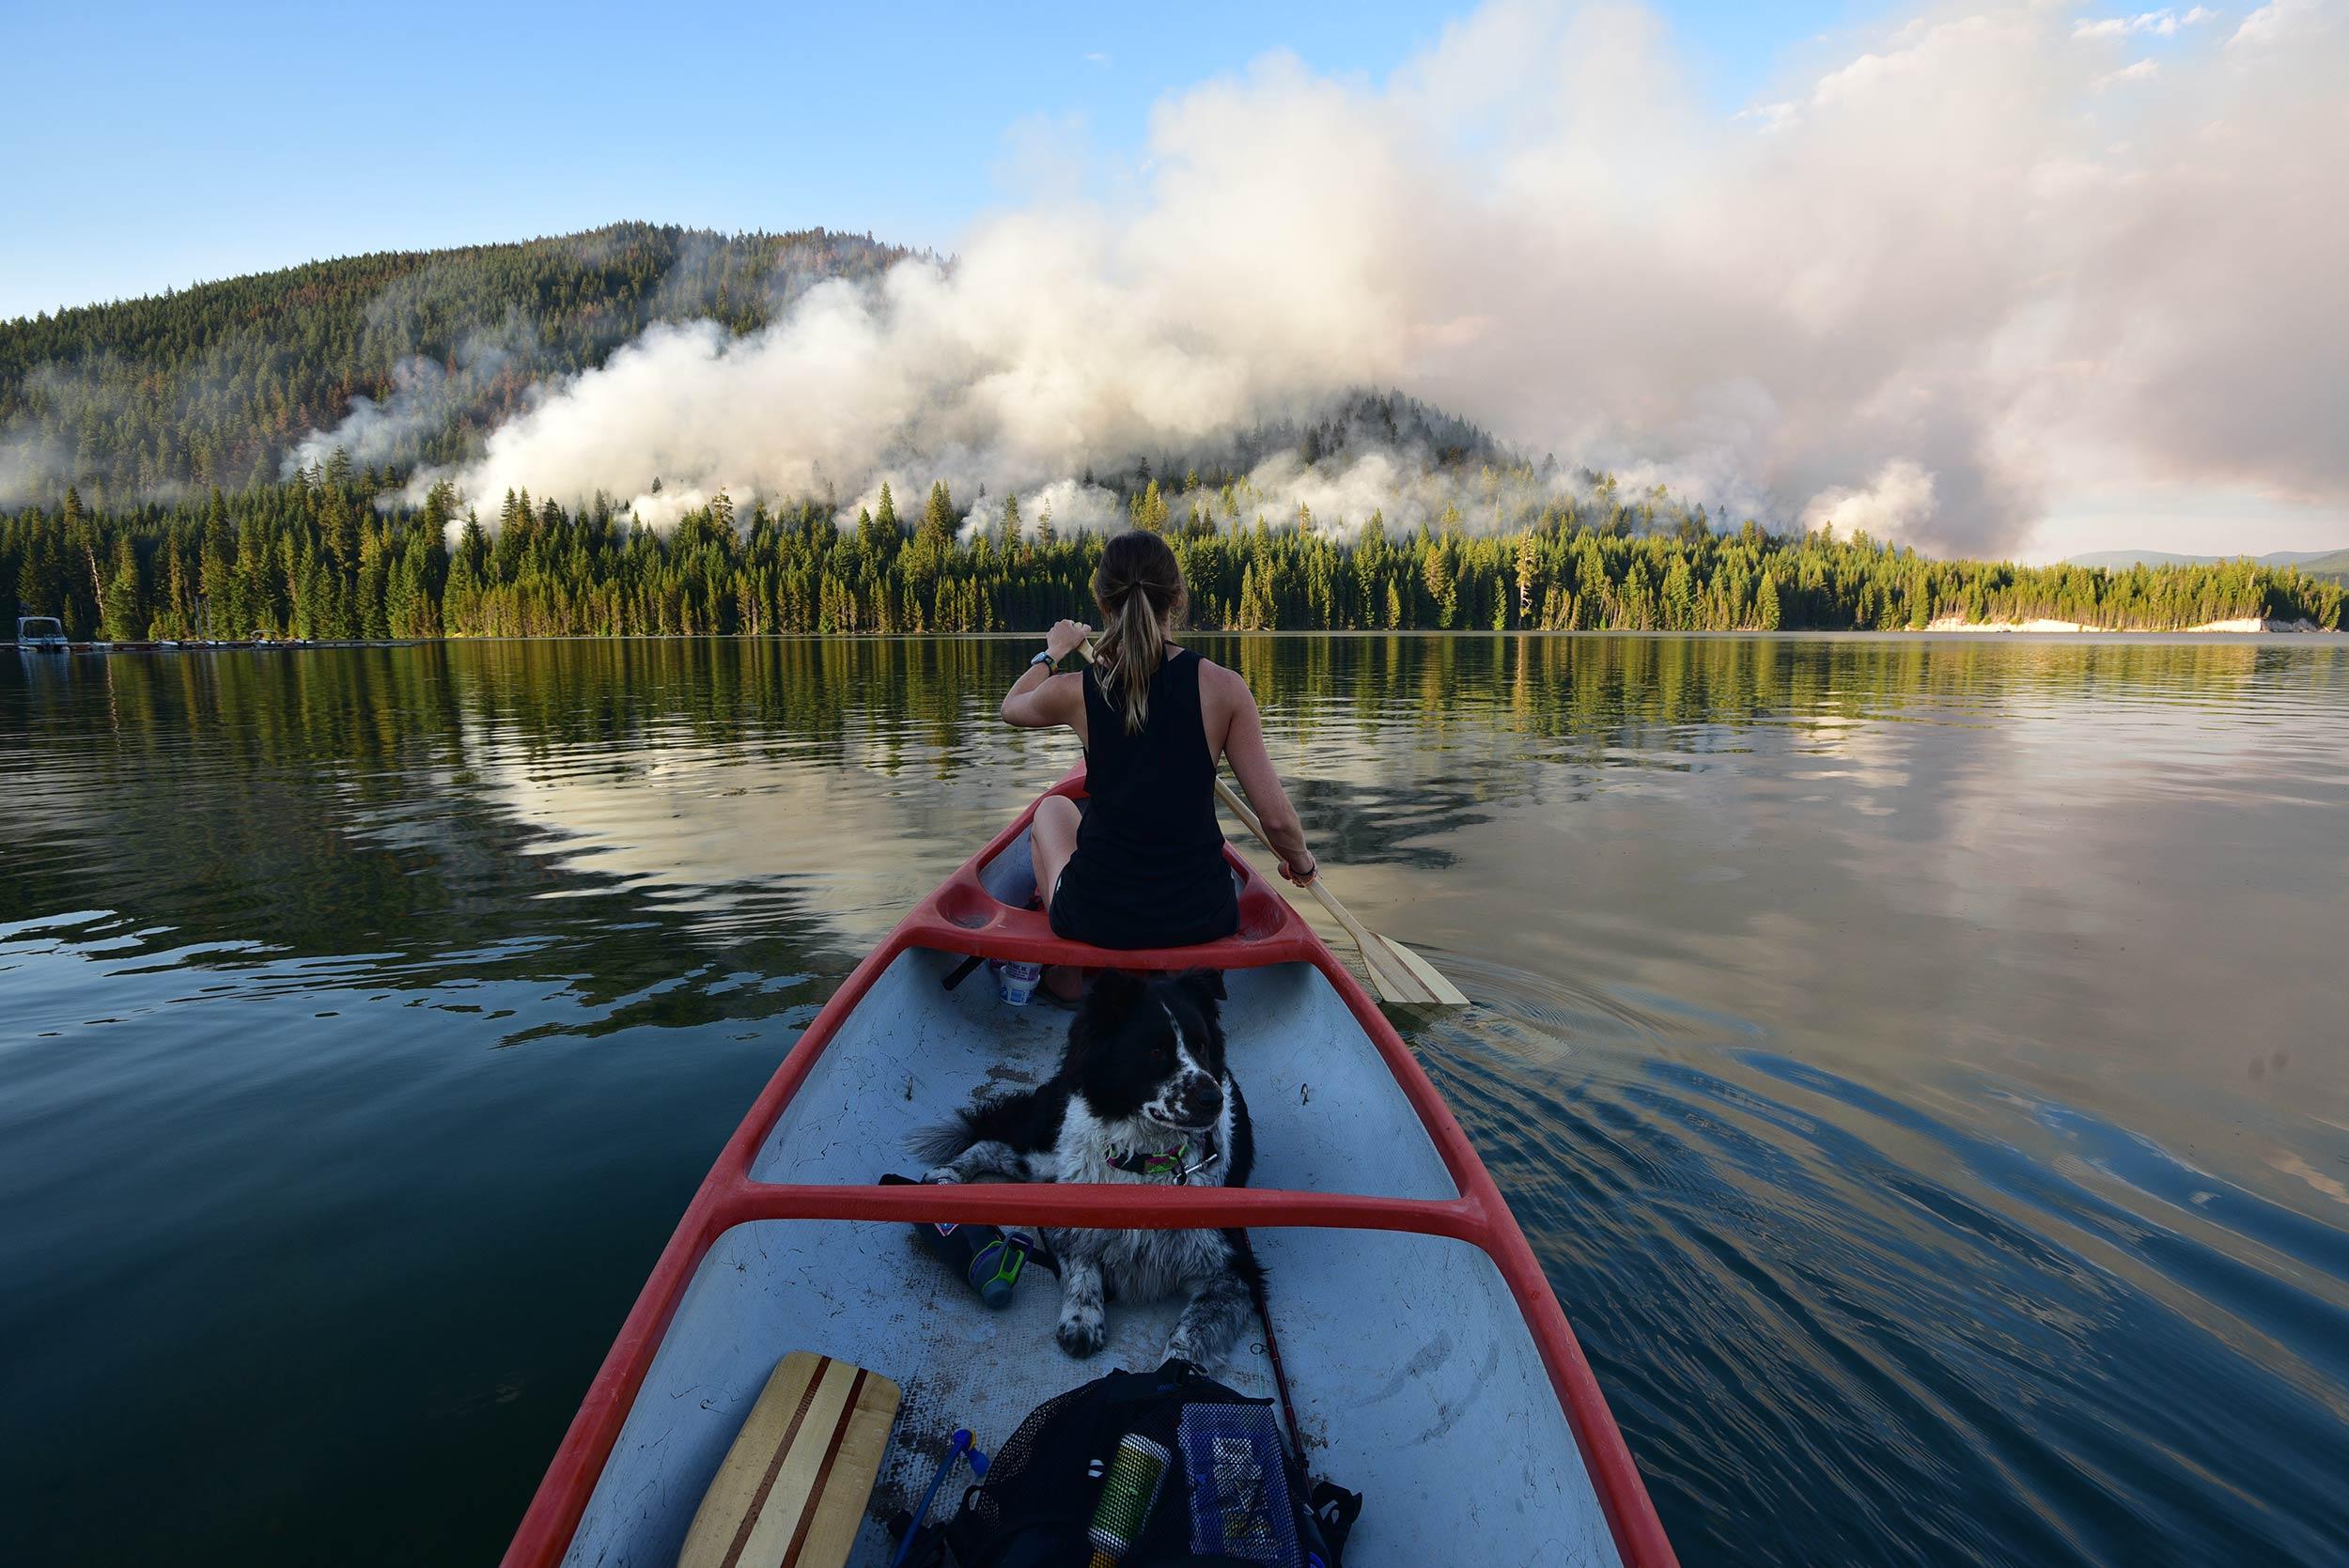 candice_dog_lake_canoe_fires.jpg